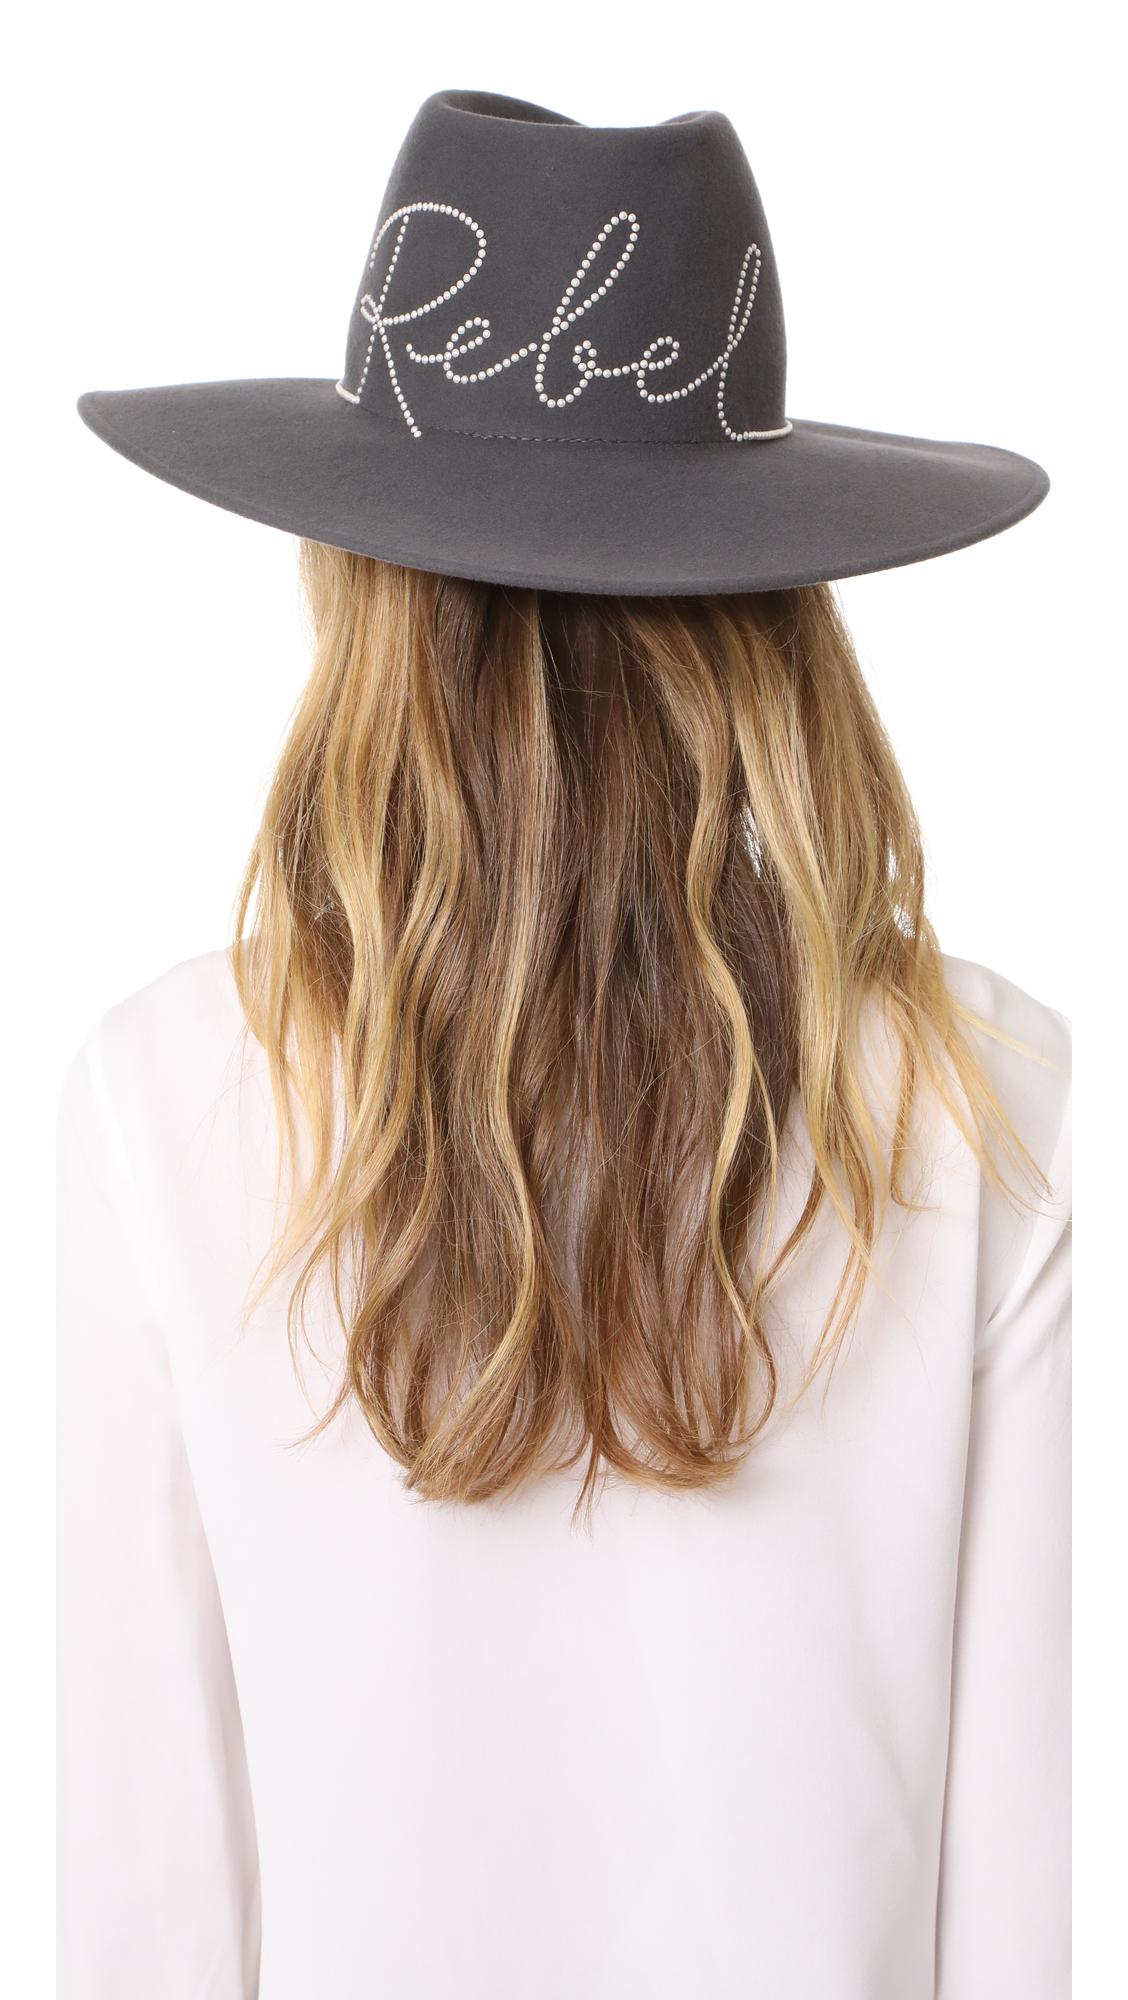 Eugenia Kim Harlowe Rebel Hat - Grey